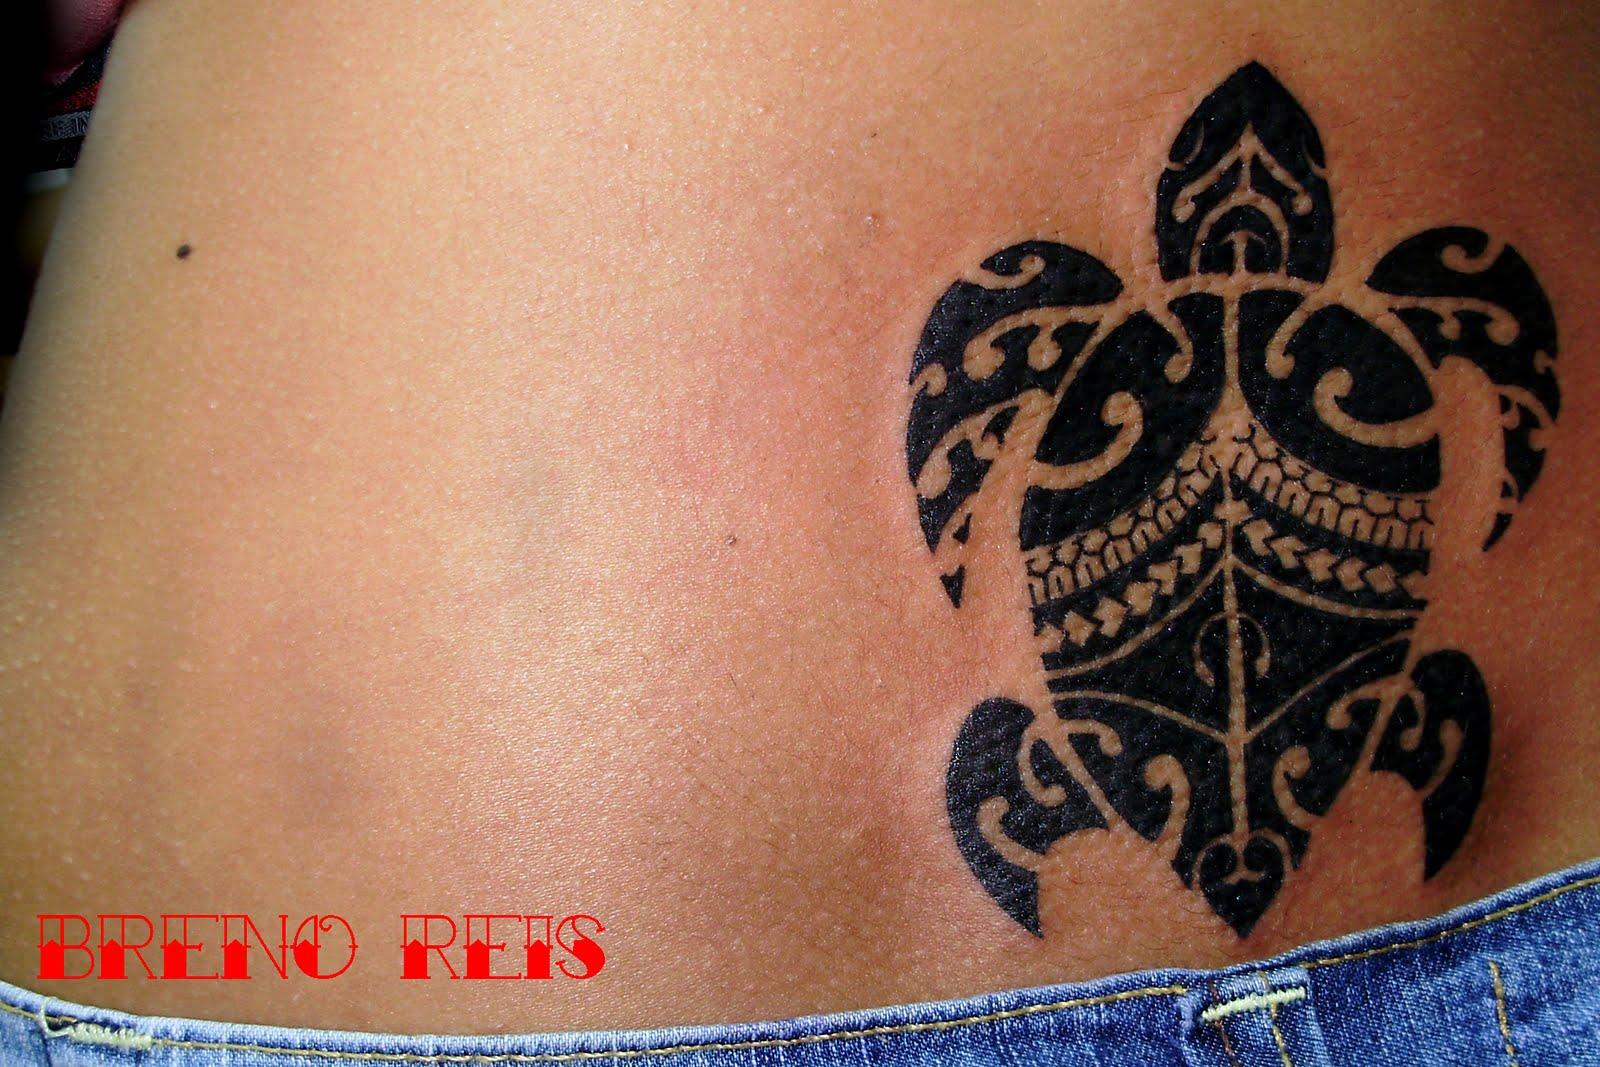 Maori tattoo turtle image 267507 on favim com - Tatuagens Maoris Treze Tatuagens